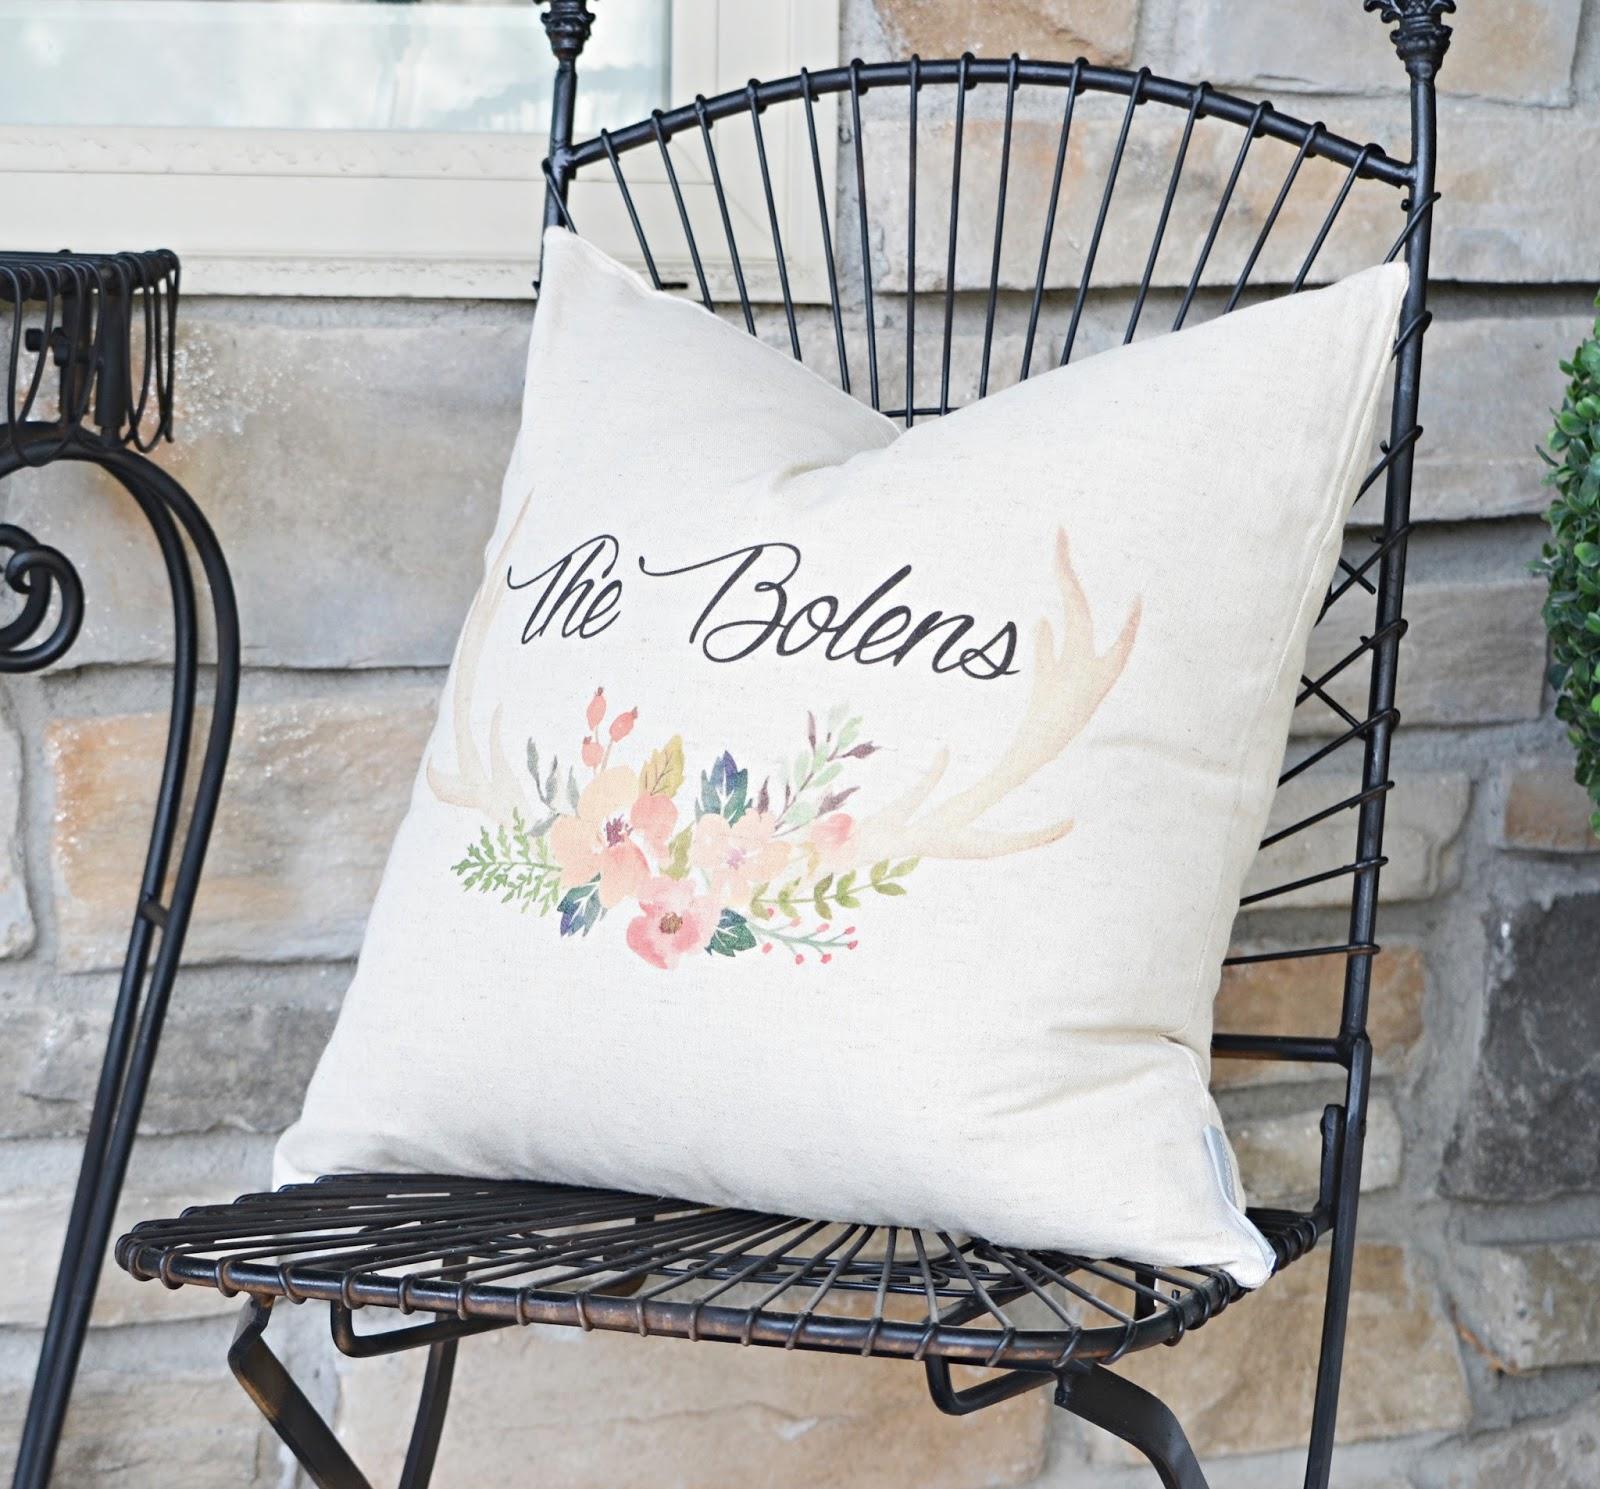 sovintagechic,upcycle, patio, patio furniture, outdoor decor